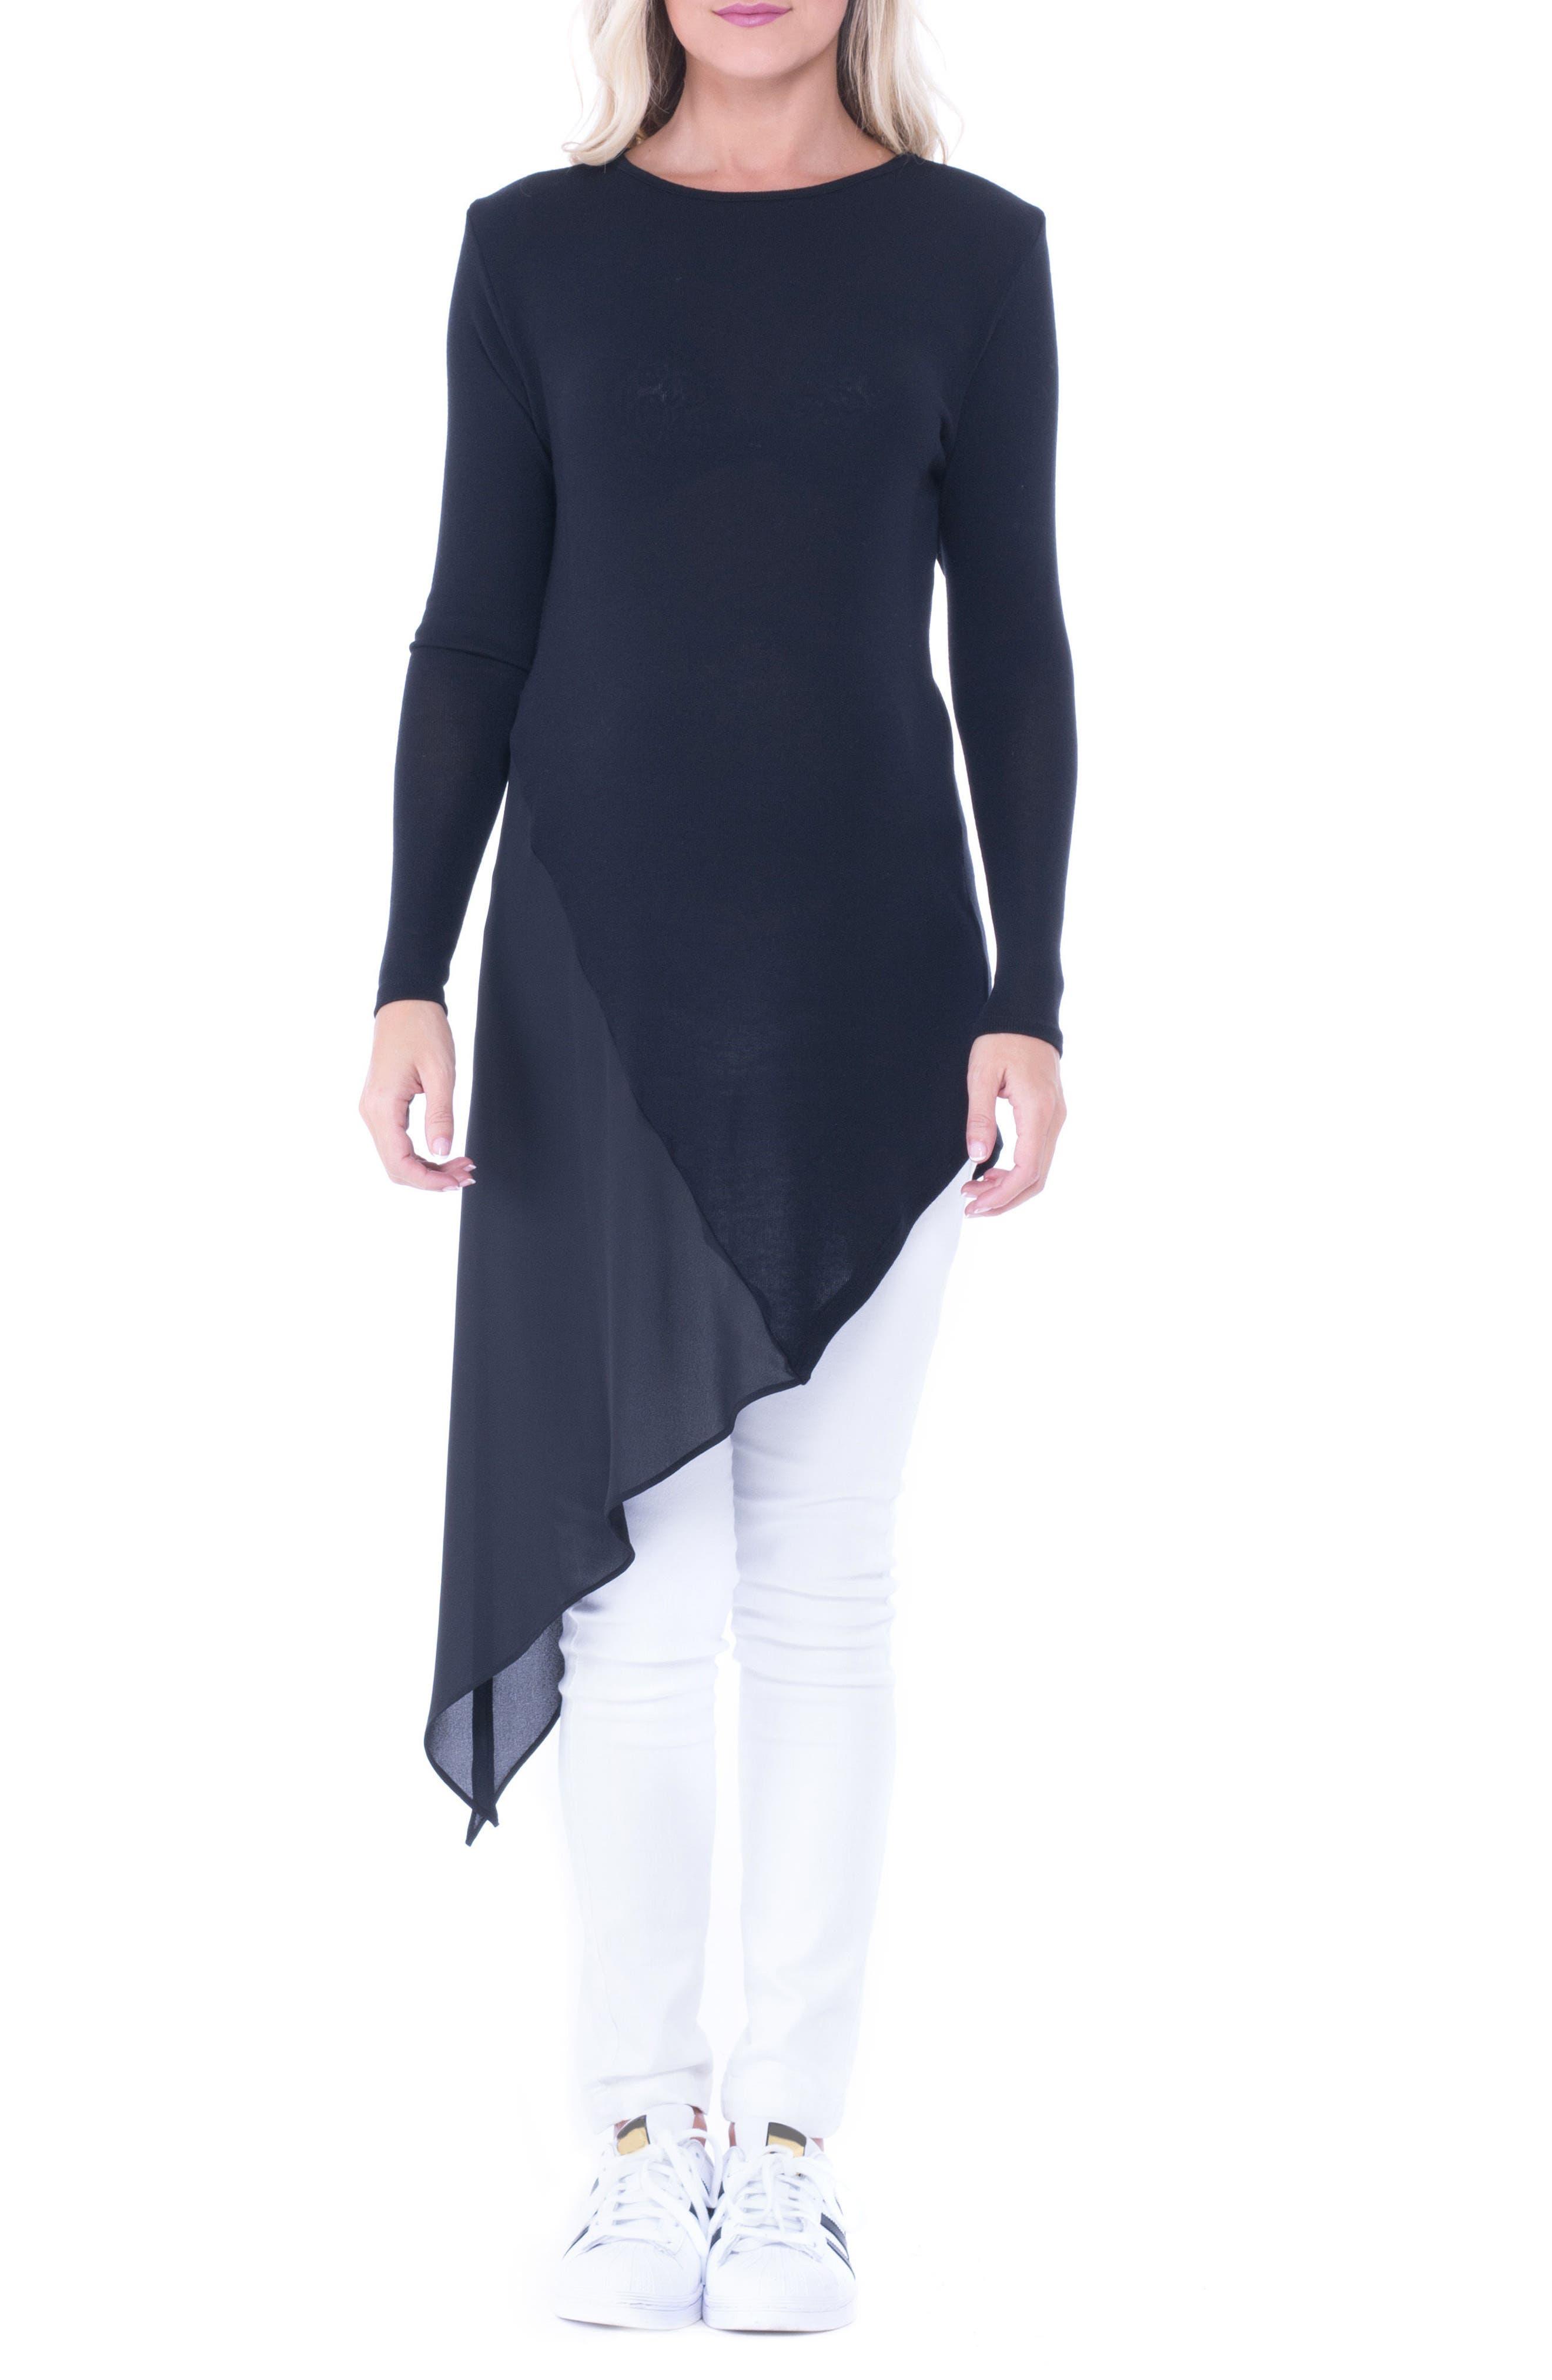 Alternate Image 1 Selected - Olian Leah Side Tie Maternity Top